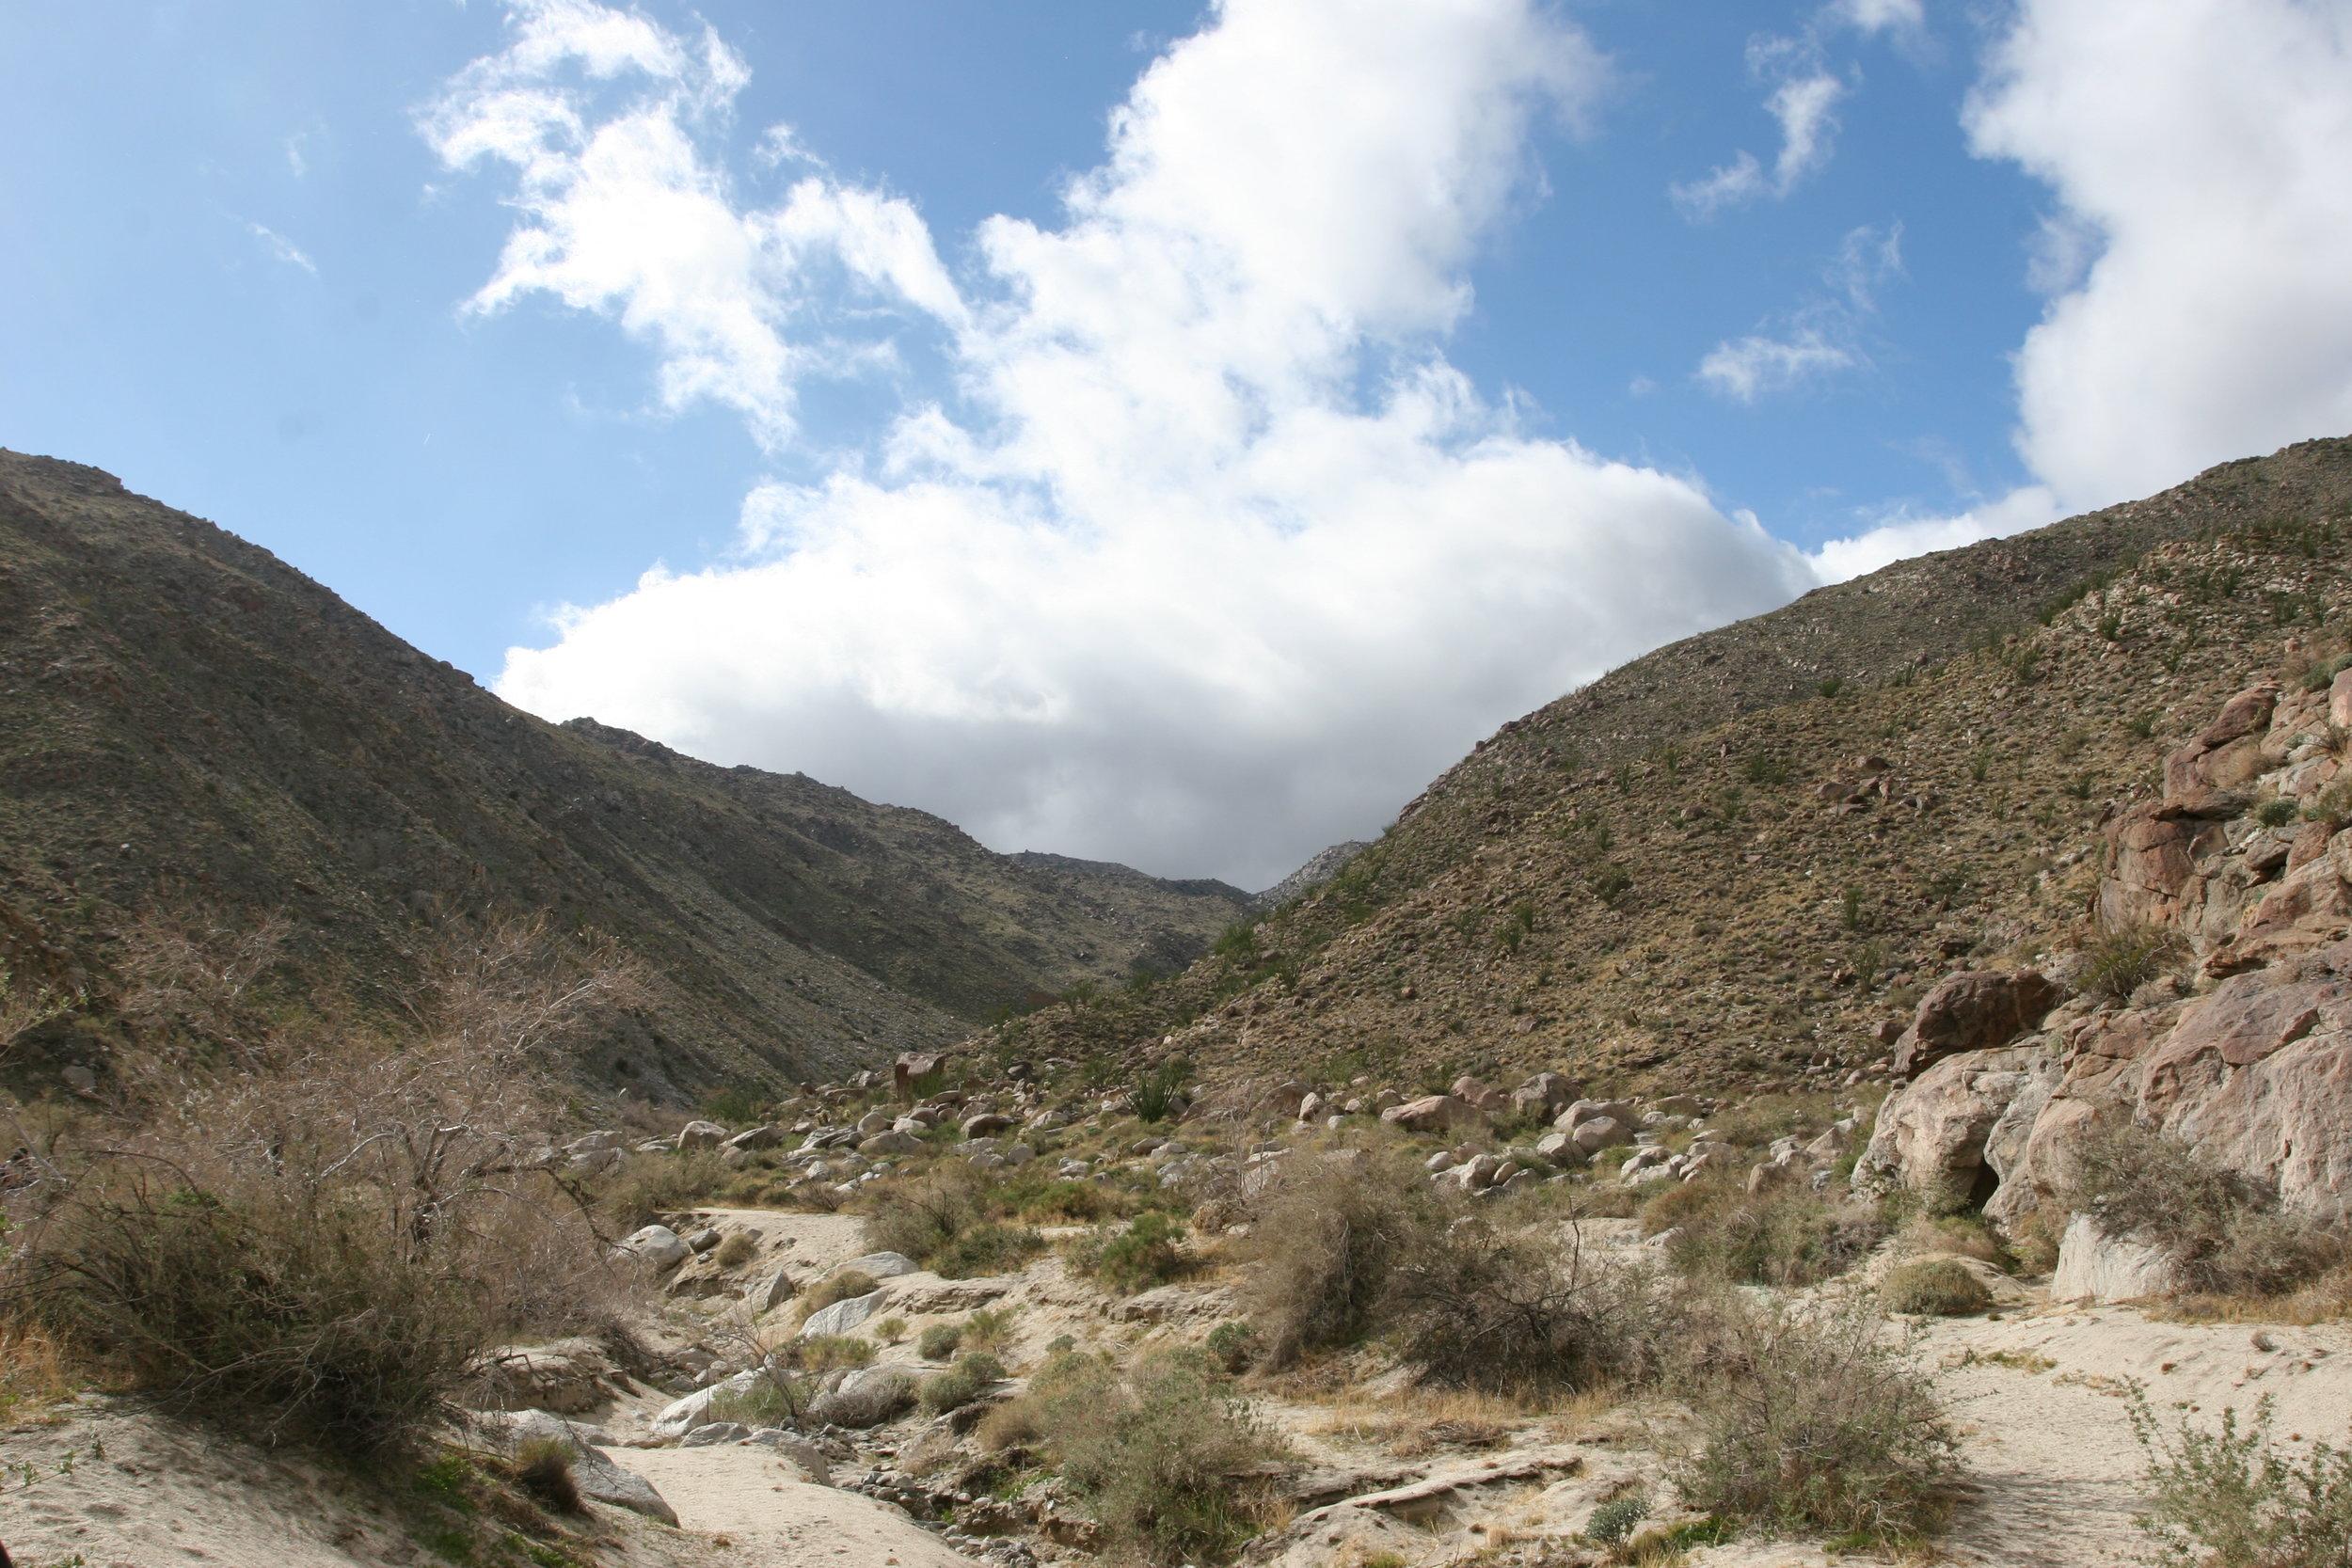 The Anza-Borrego Desert: potentially home to Southern California's own bigfoot.